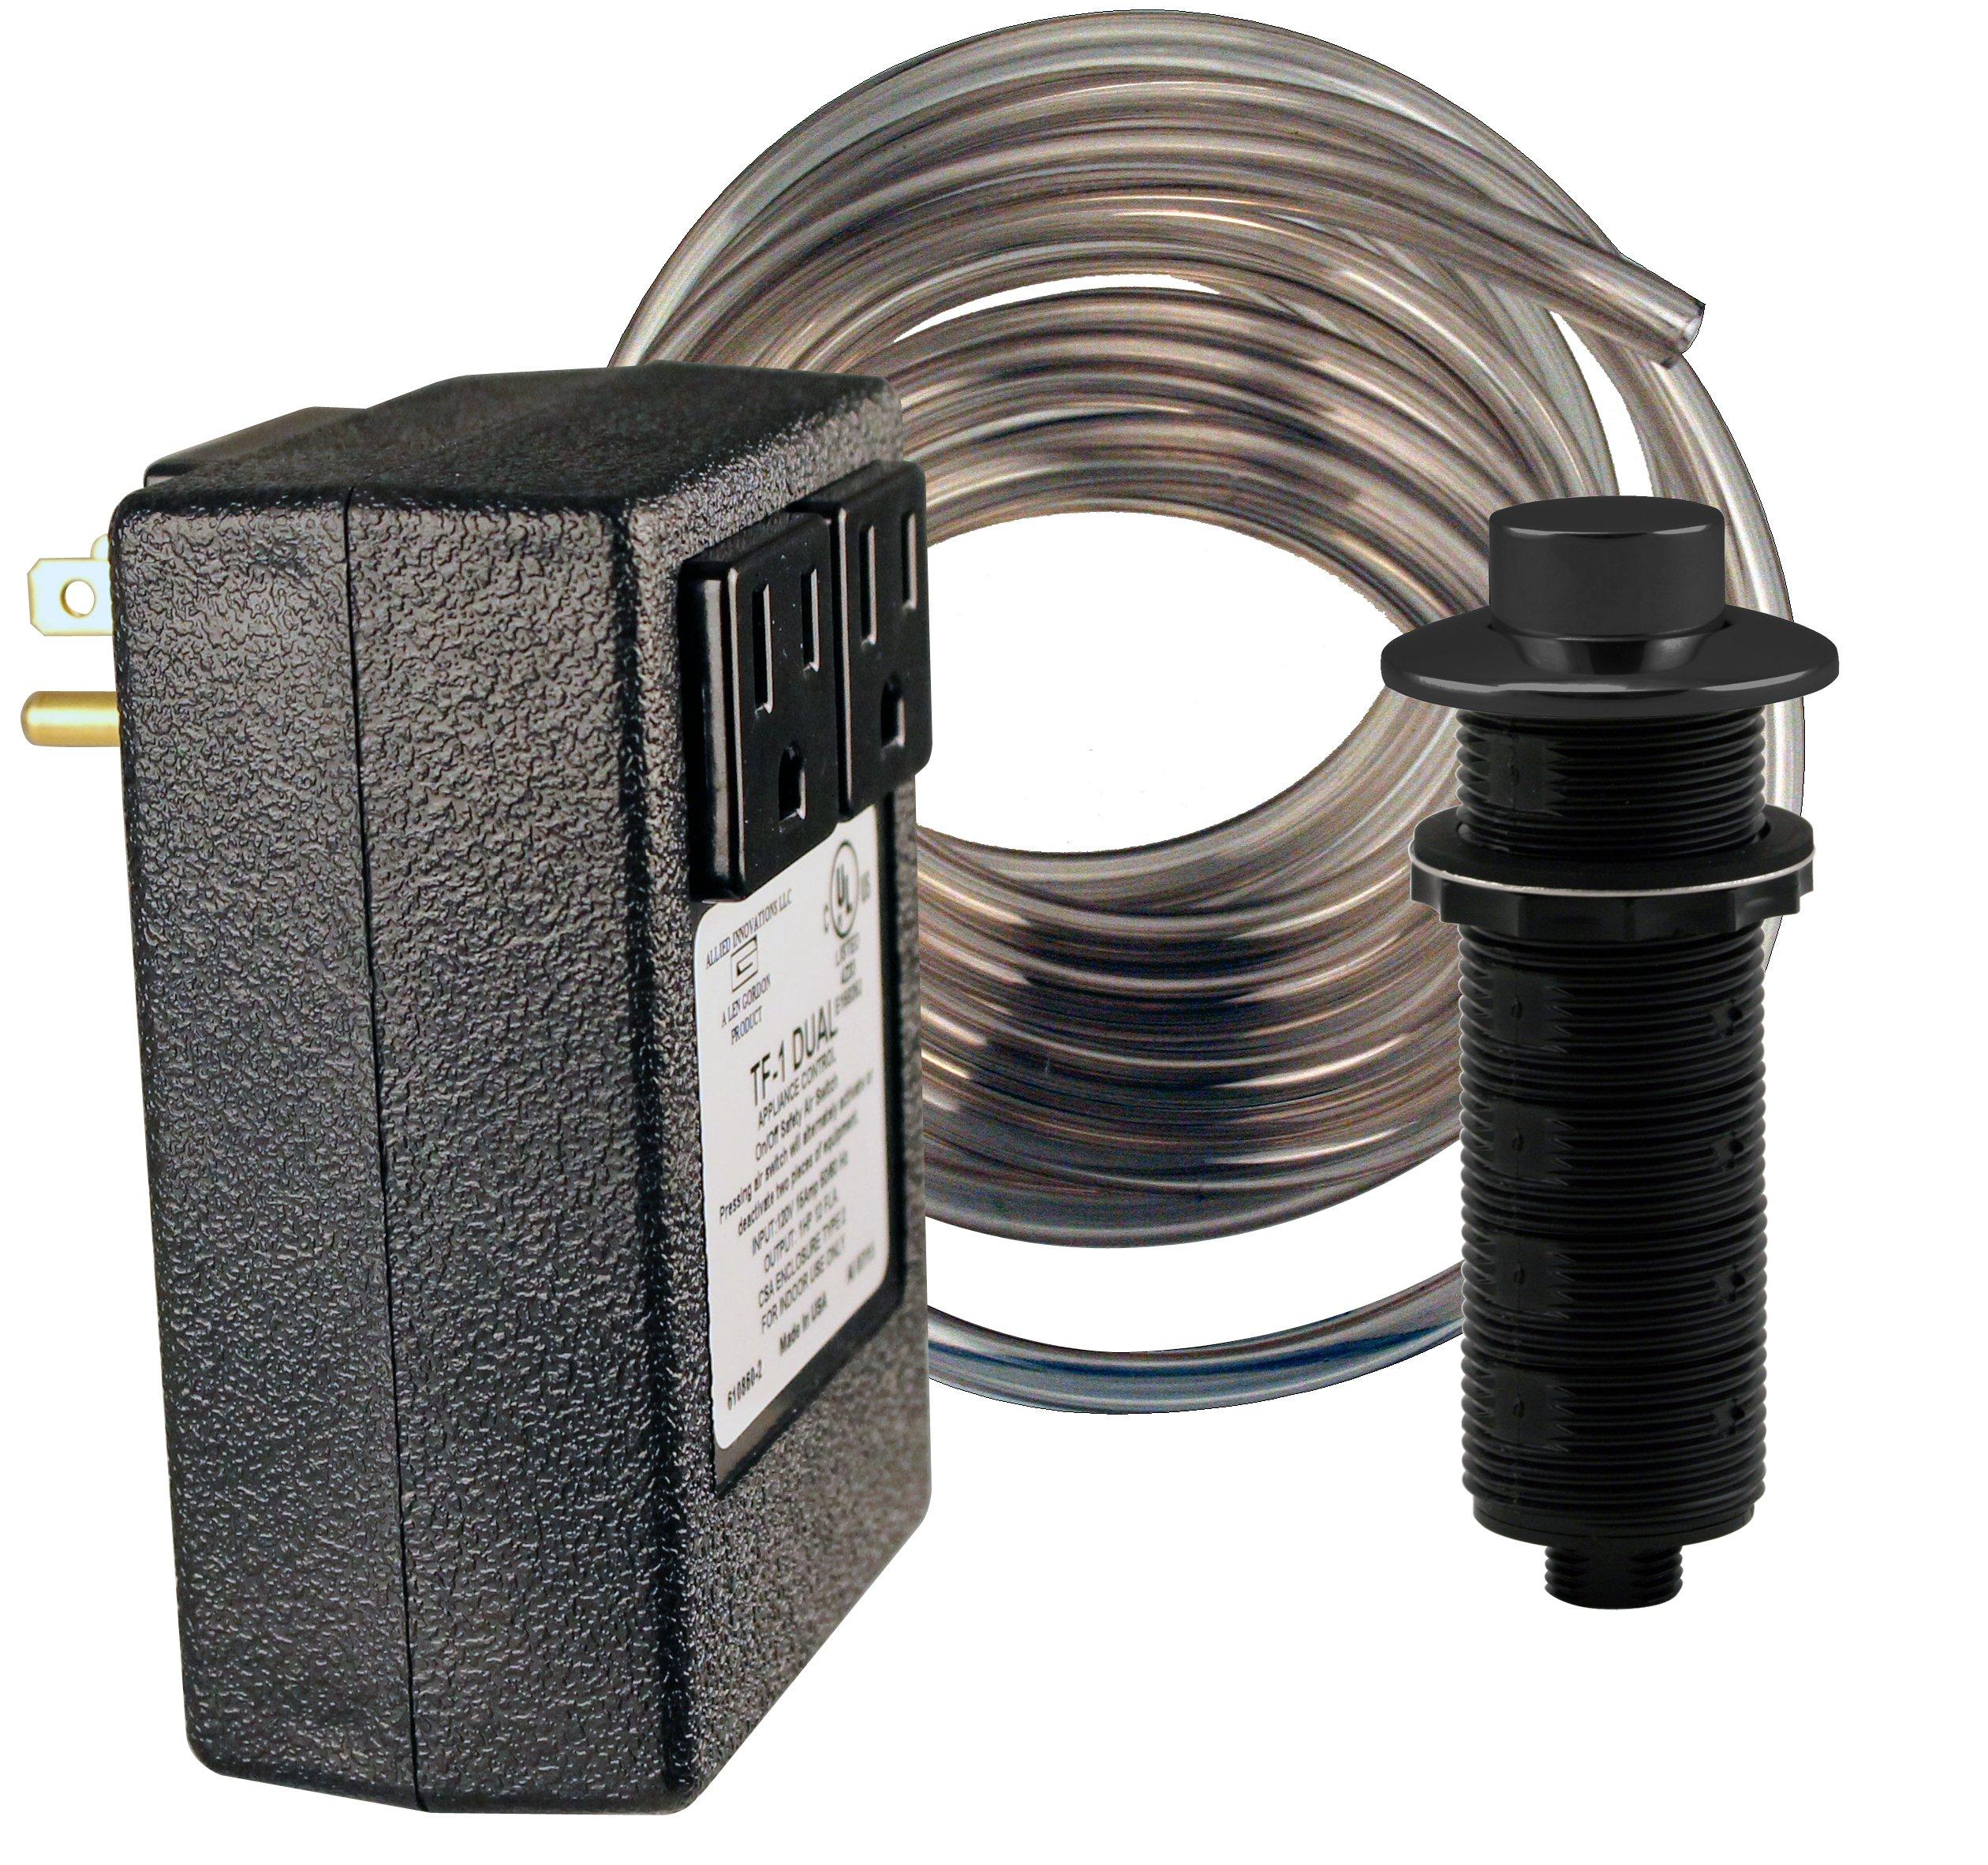 Westbrass RASB-2RB3-62 Raised Button Sink Top Disposal Air Switch & Dual Outlet Control Box, Matte Black